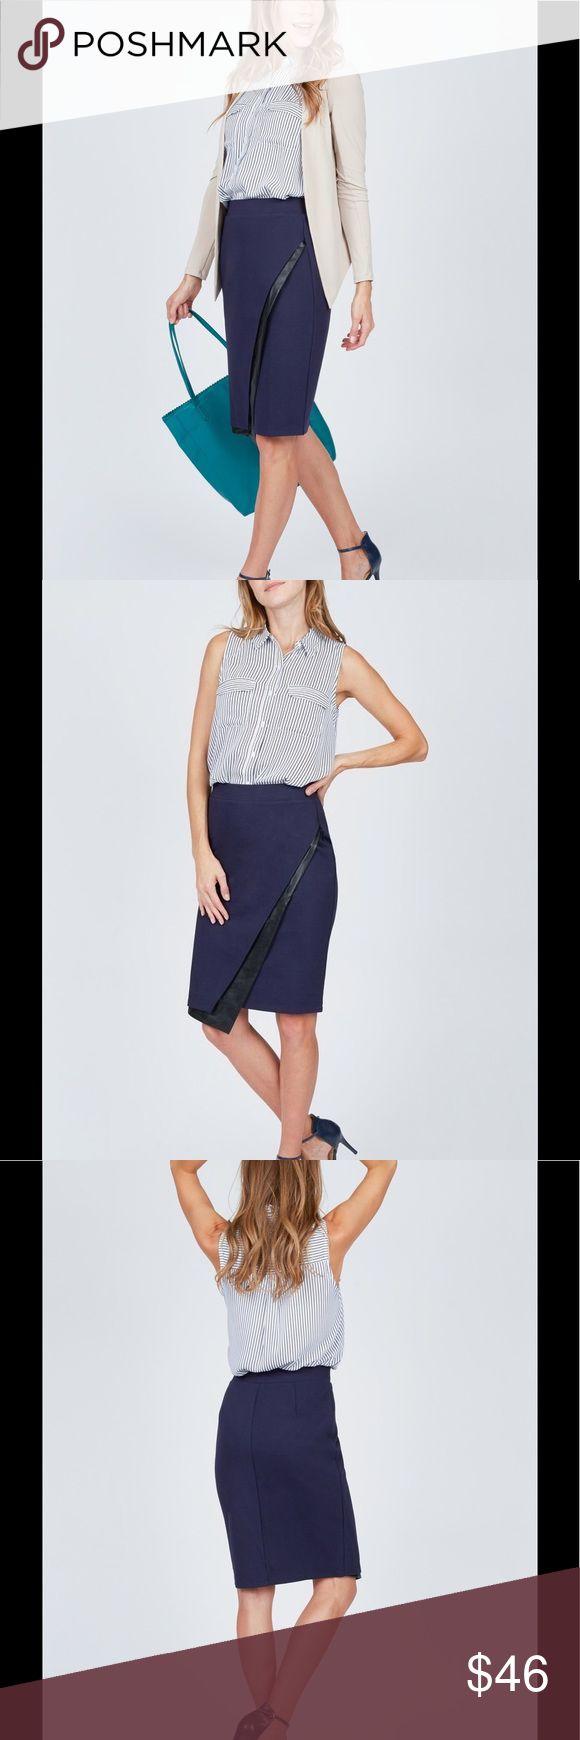 Noir Asymmetrical PU Skirt Stretchy Navy Pencil Skirt with faux leather Asymmetrical detail. Used once noir Skirts Asymmetrical